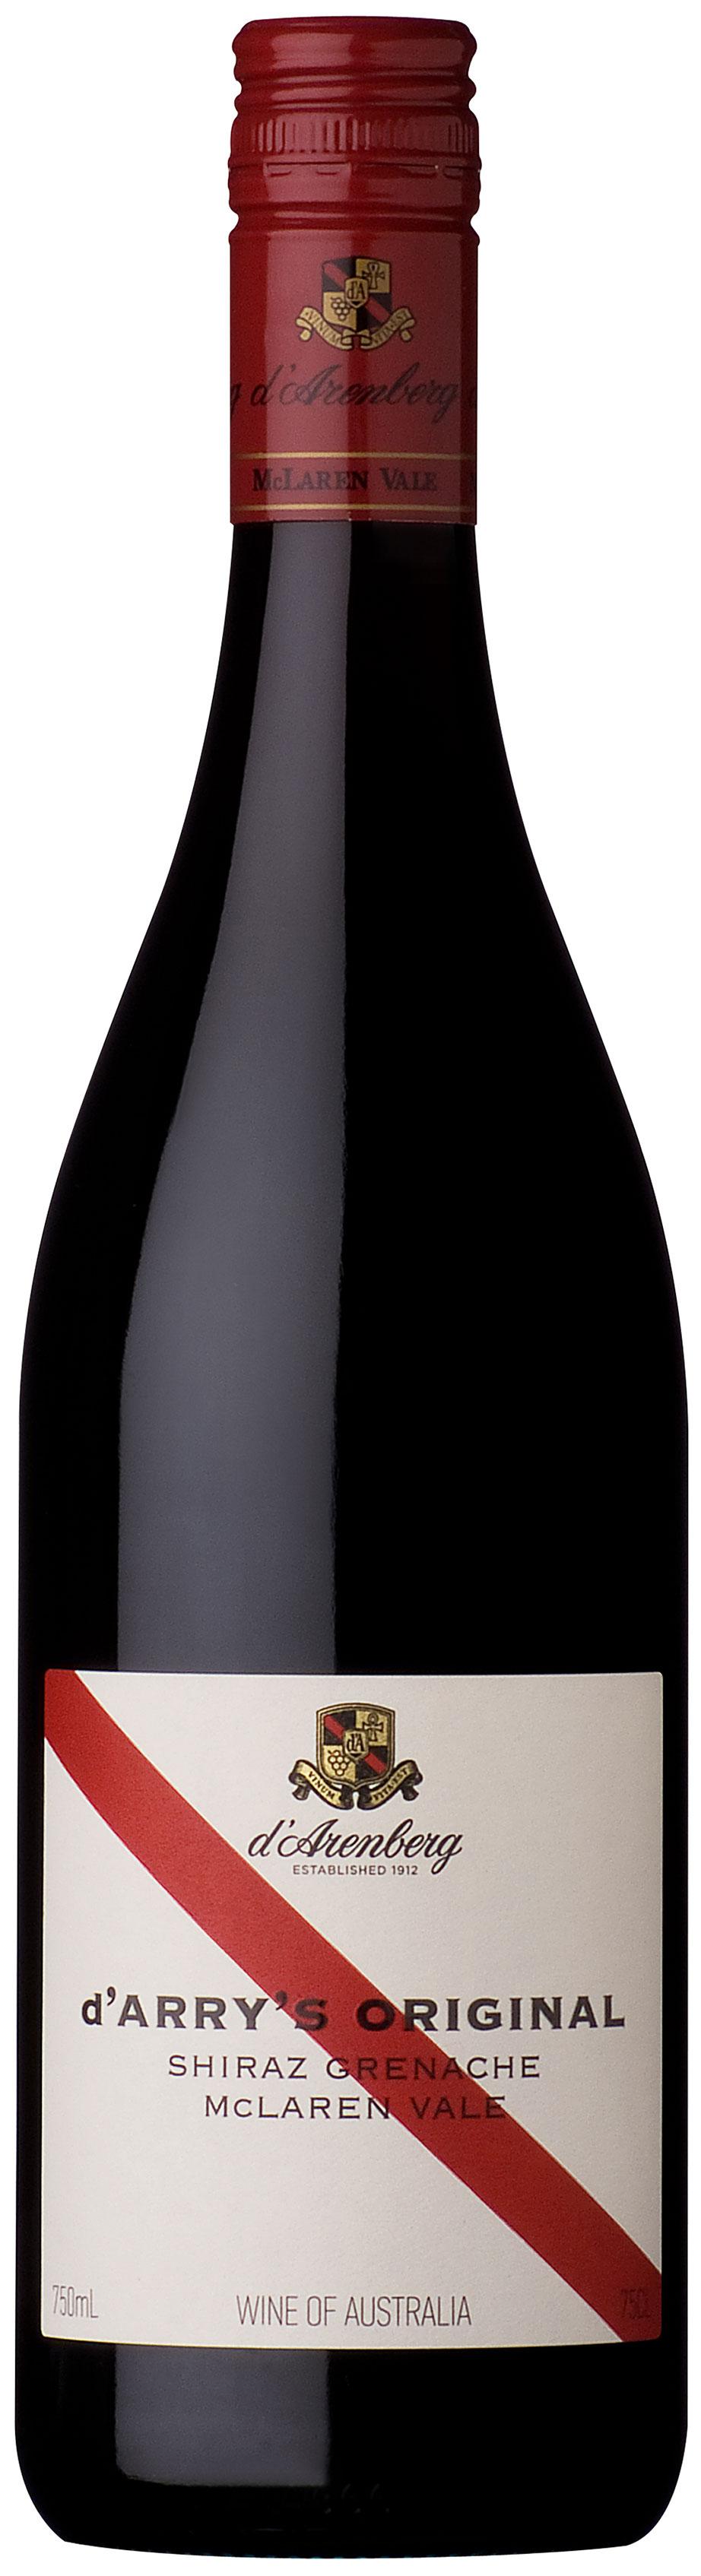 https://vinocorpperu.com/images/vinos/darenberg/darrys_original_shiraz_grenache_2016.jpg